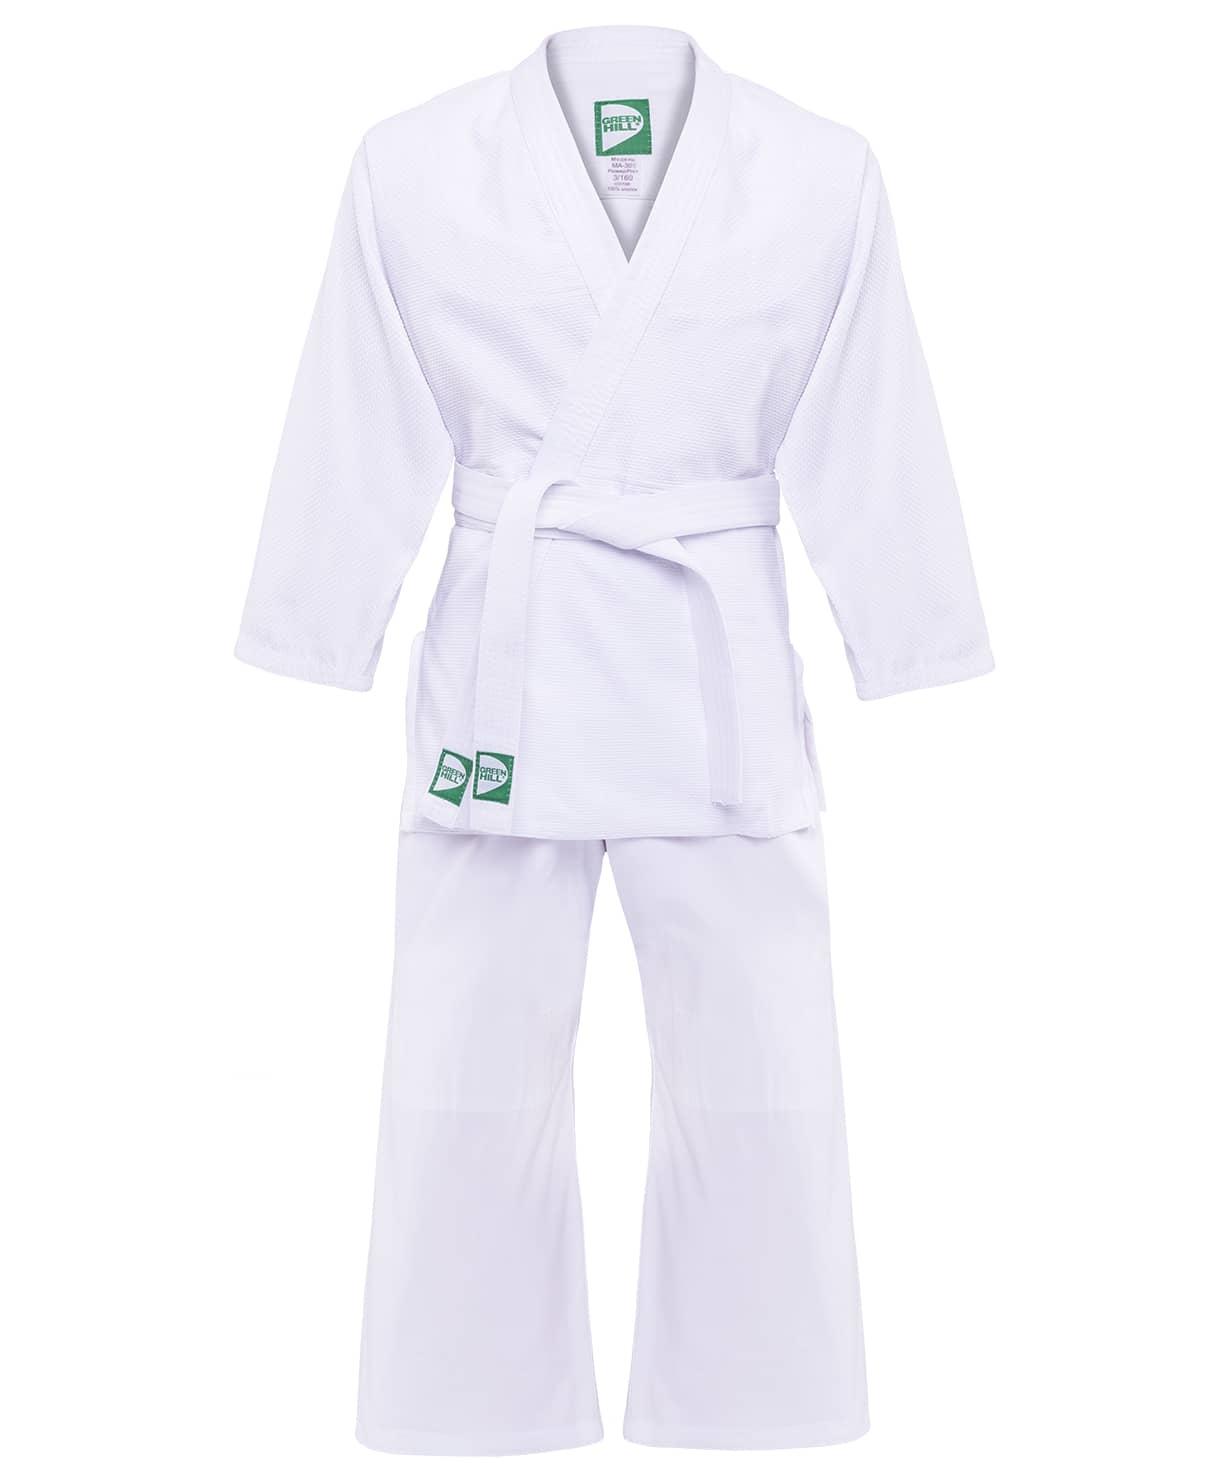 Кимоно для дзюдо MA-302 белый, р.3/160